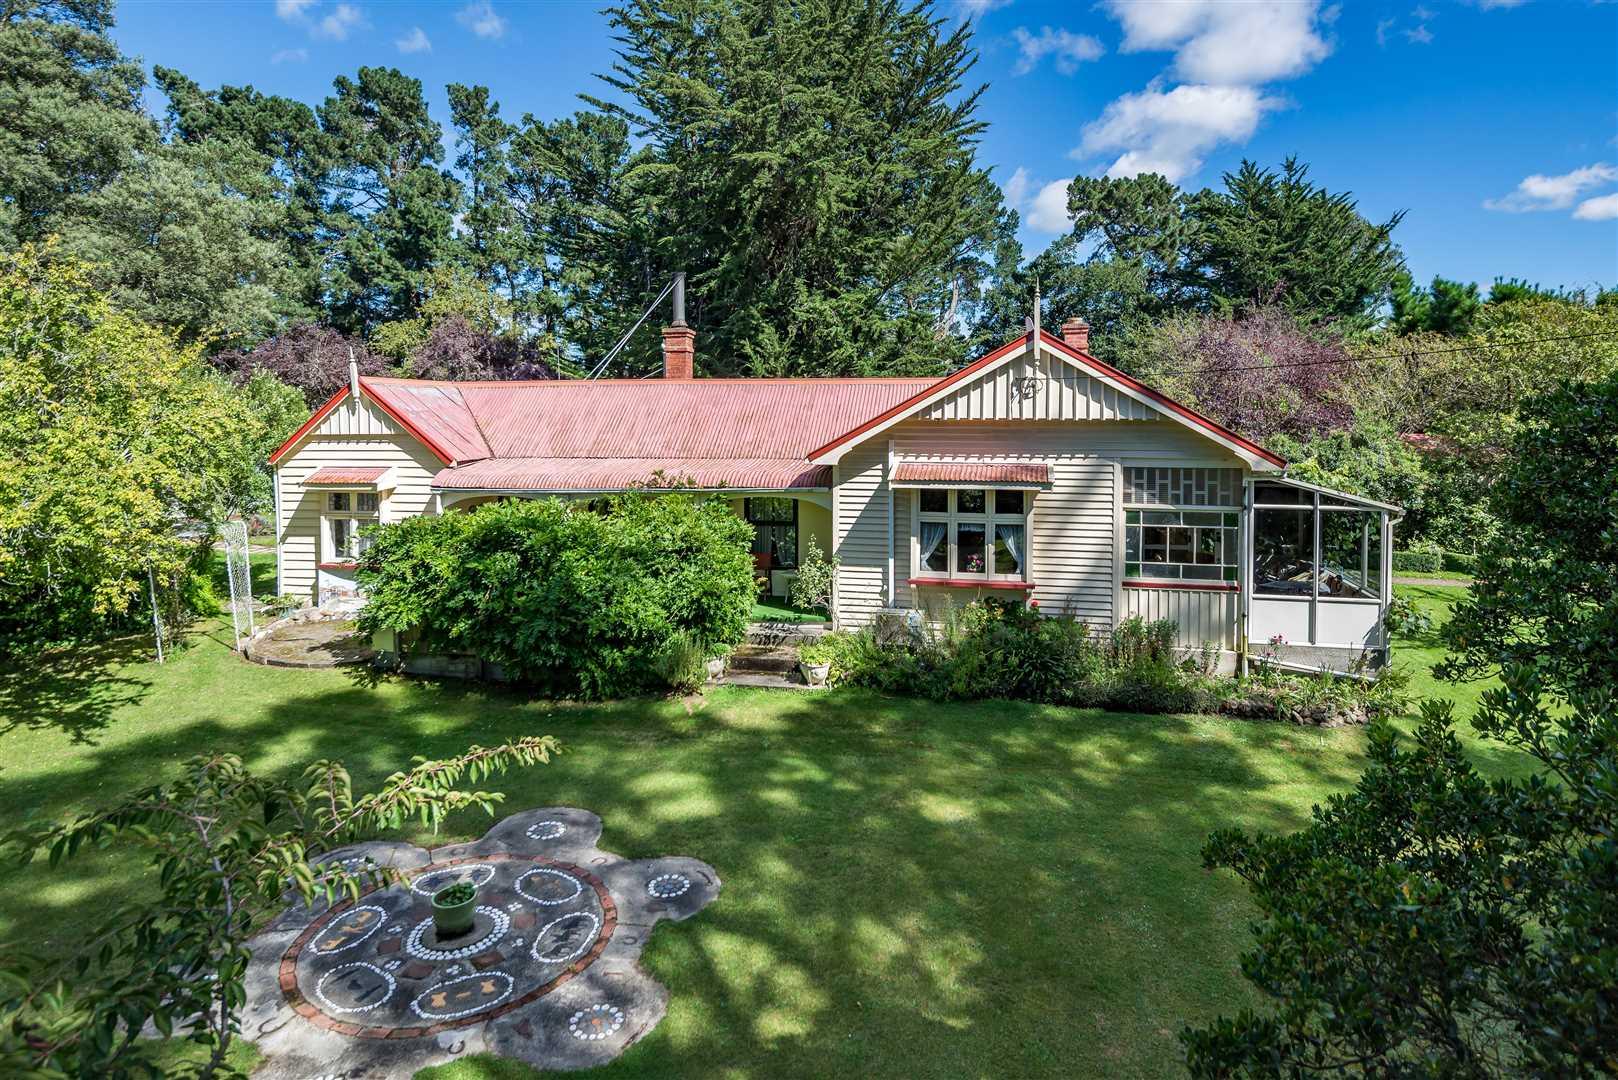 Historic Home - Ready for Rejuvenation